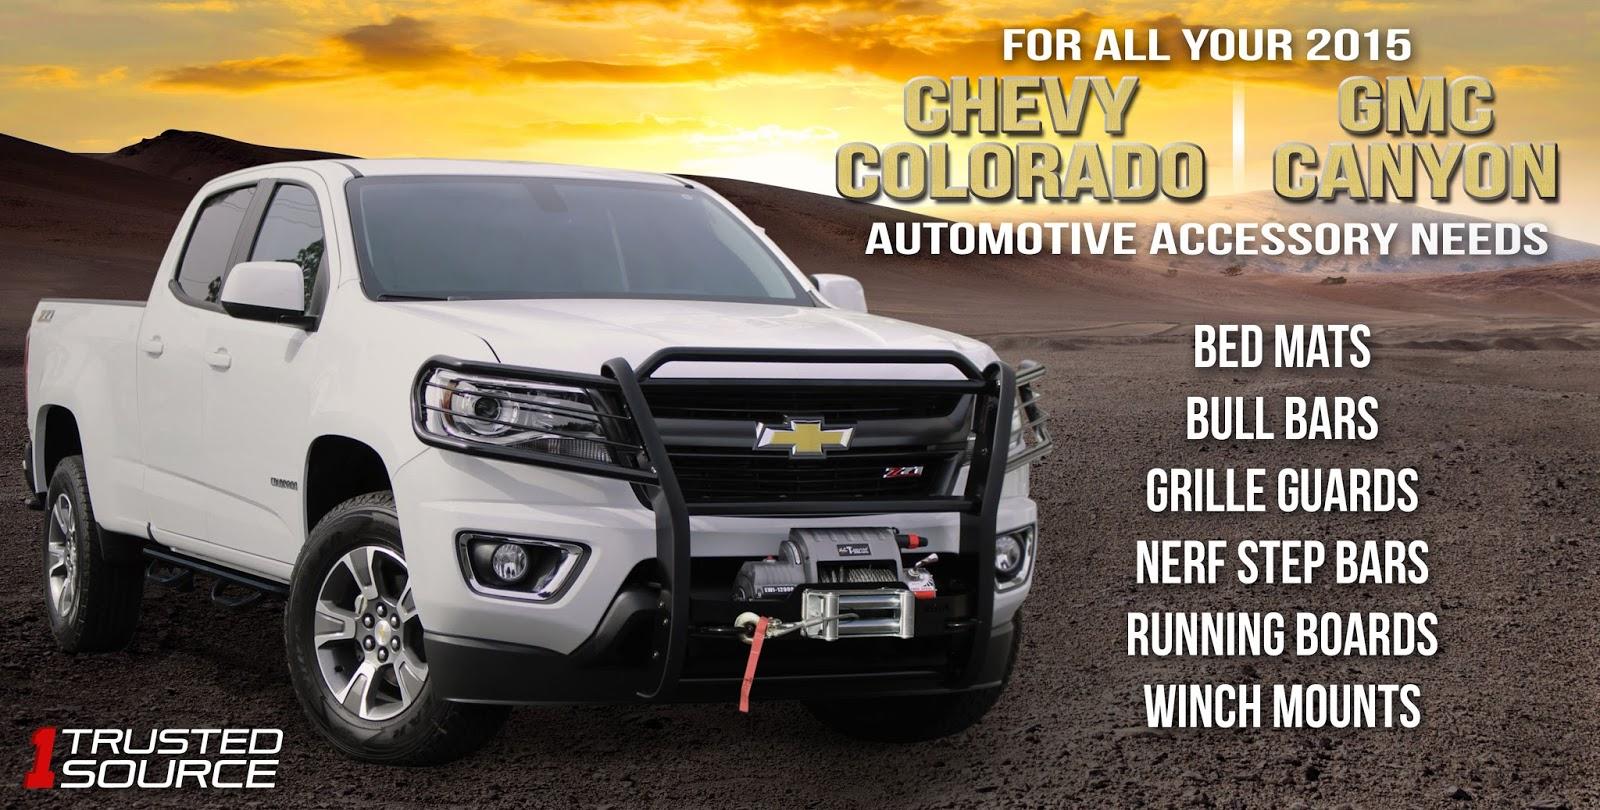 Westin Automotive Led Wiring Harness Kit Monday June 29 2015